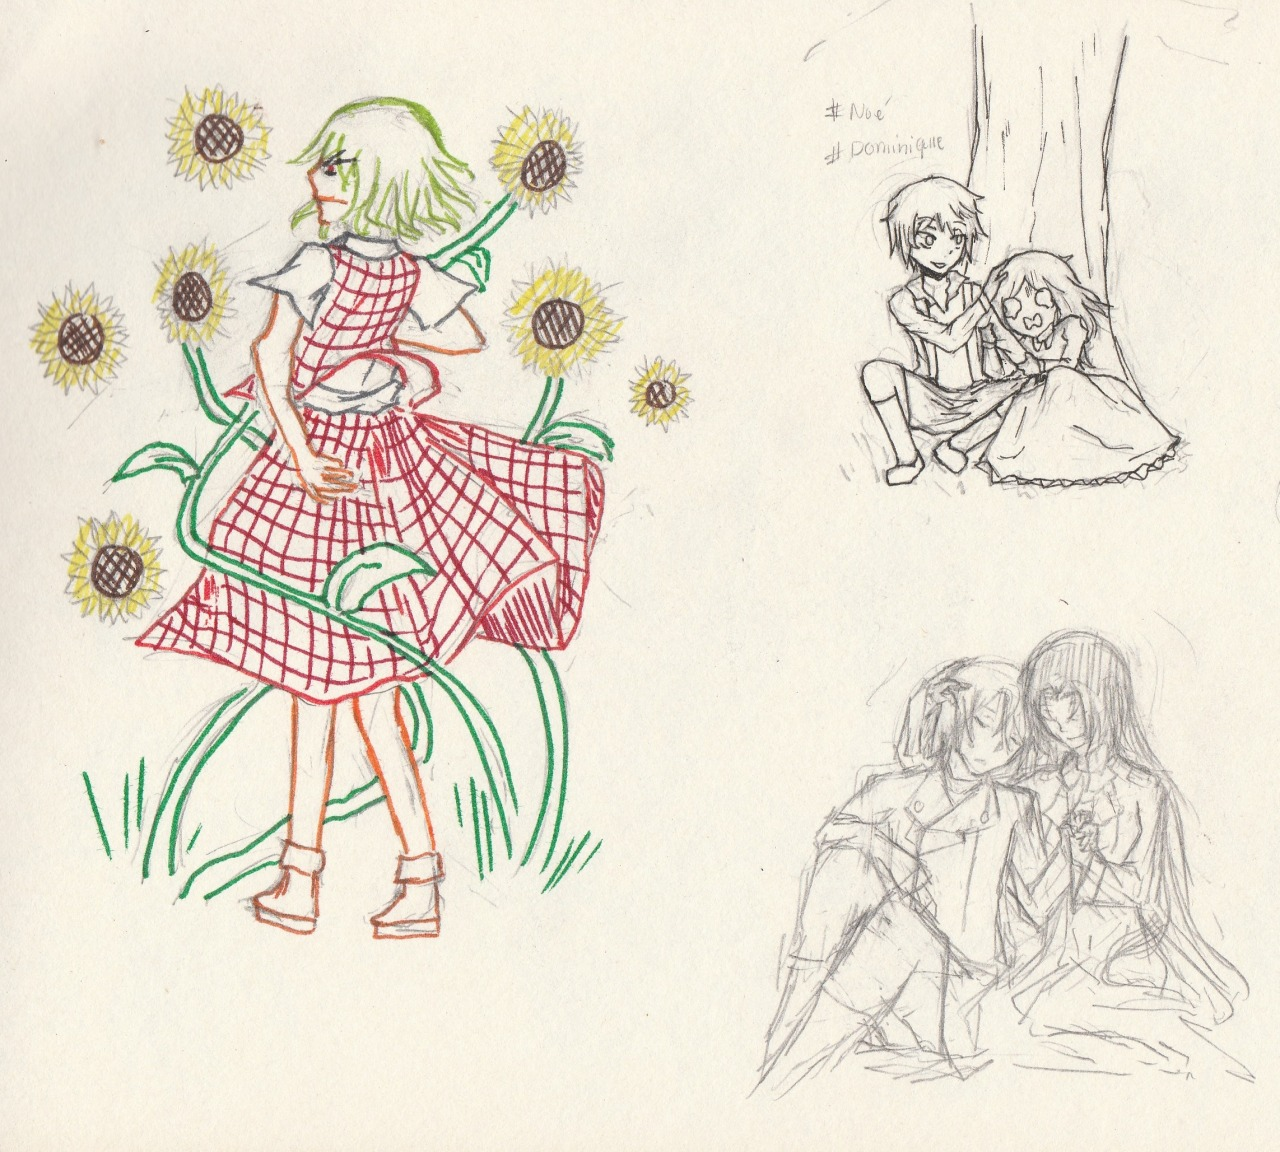 [Gallery] Tankihou: Ổ Dơi - Page 9 Tumblr_oksr7gLstI1vd0m40o3_1280